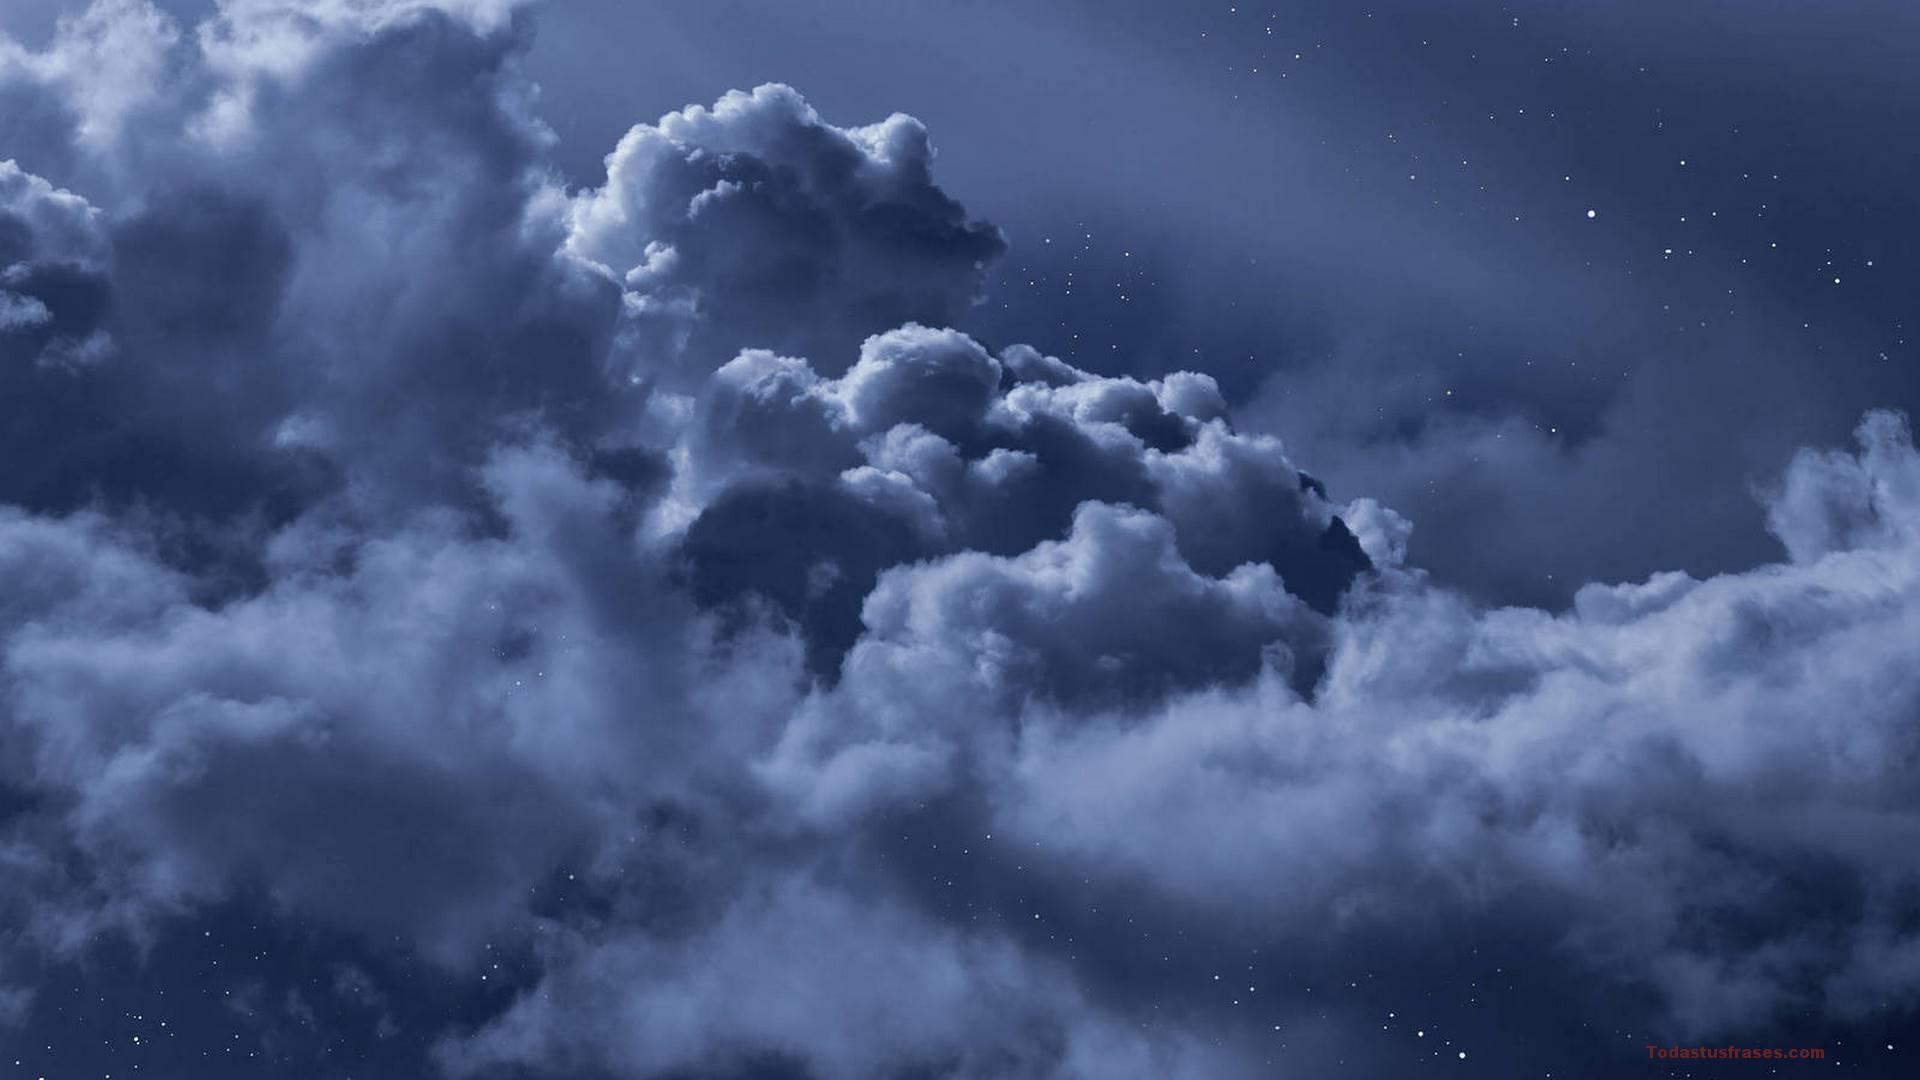 Imagenes Fondos De Pantalla: Fondos De Pantalla De Nubes